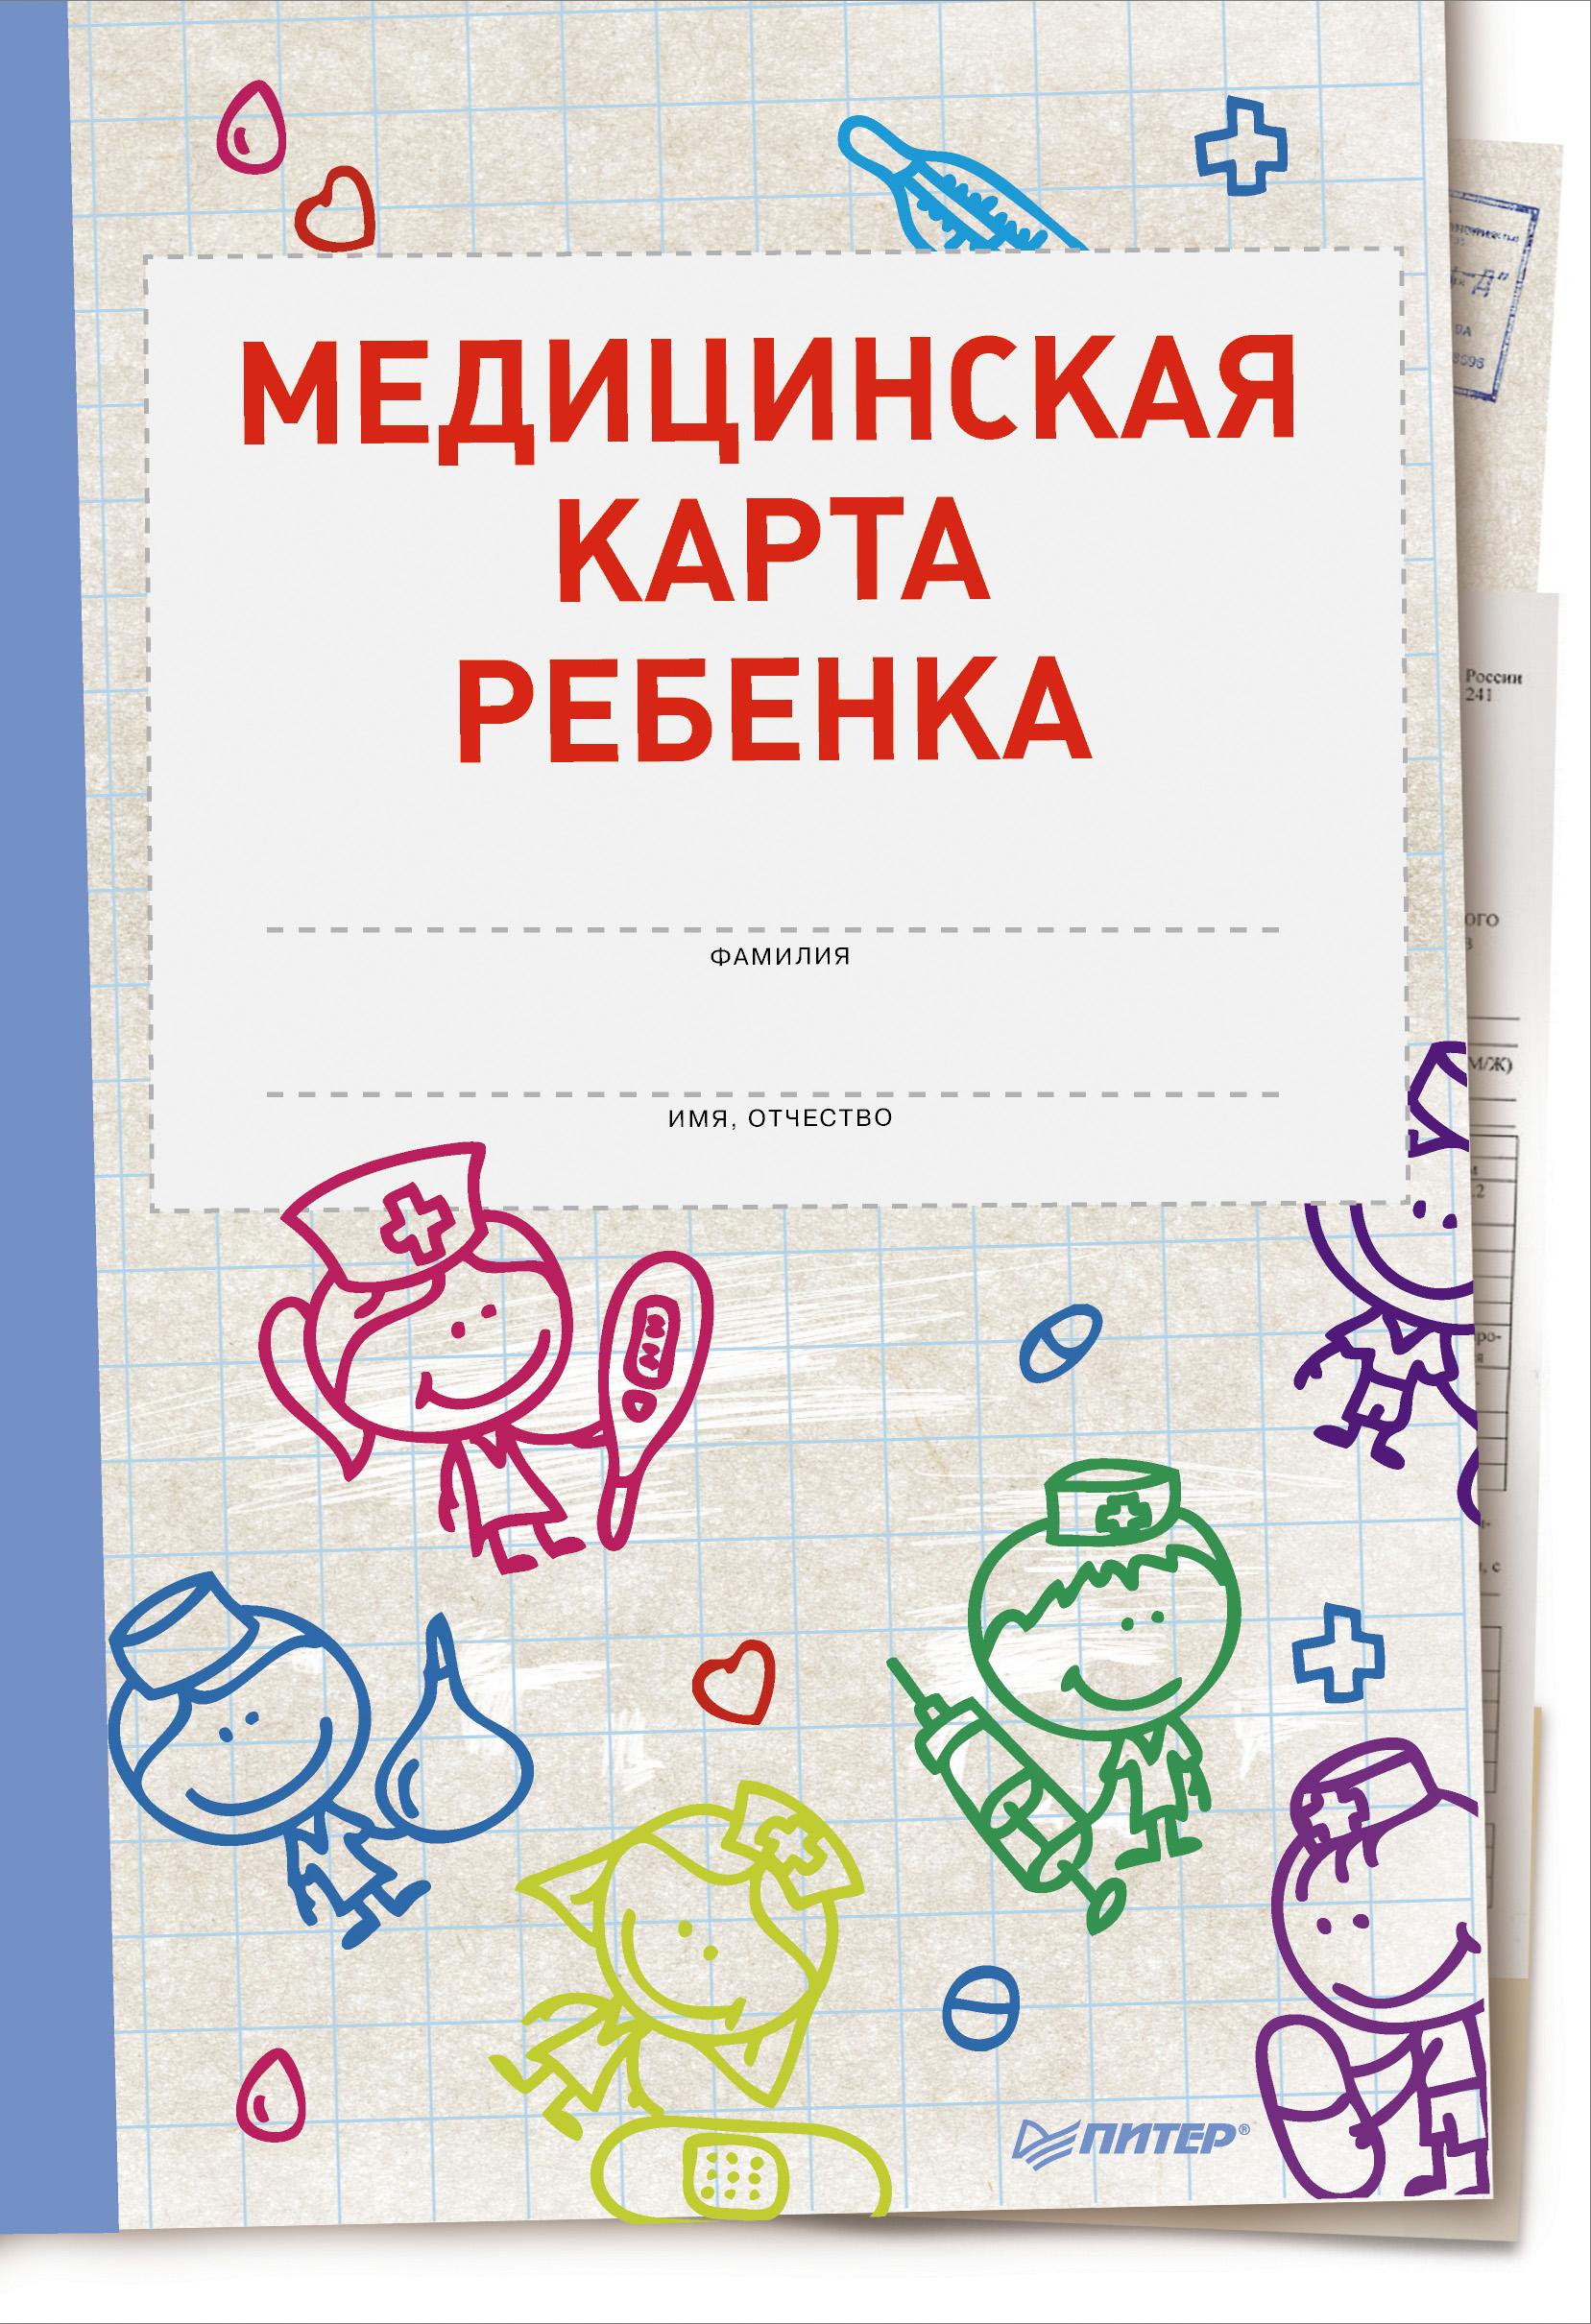 Оксана Салова Медицинская карта ребенка питер книга медицинская карта ребенка